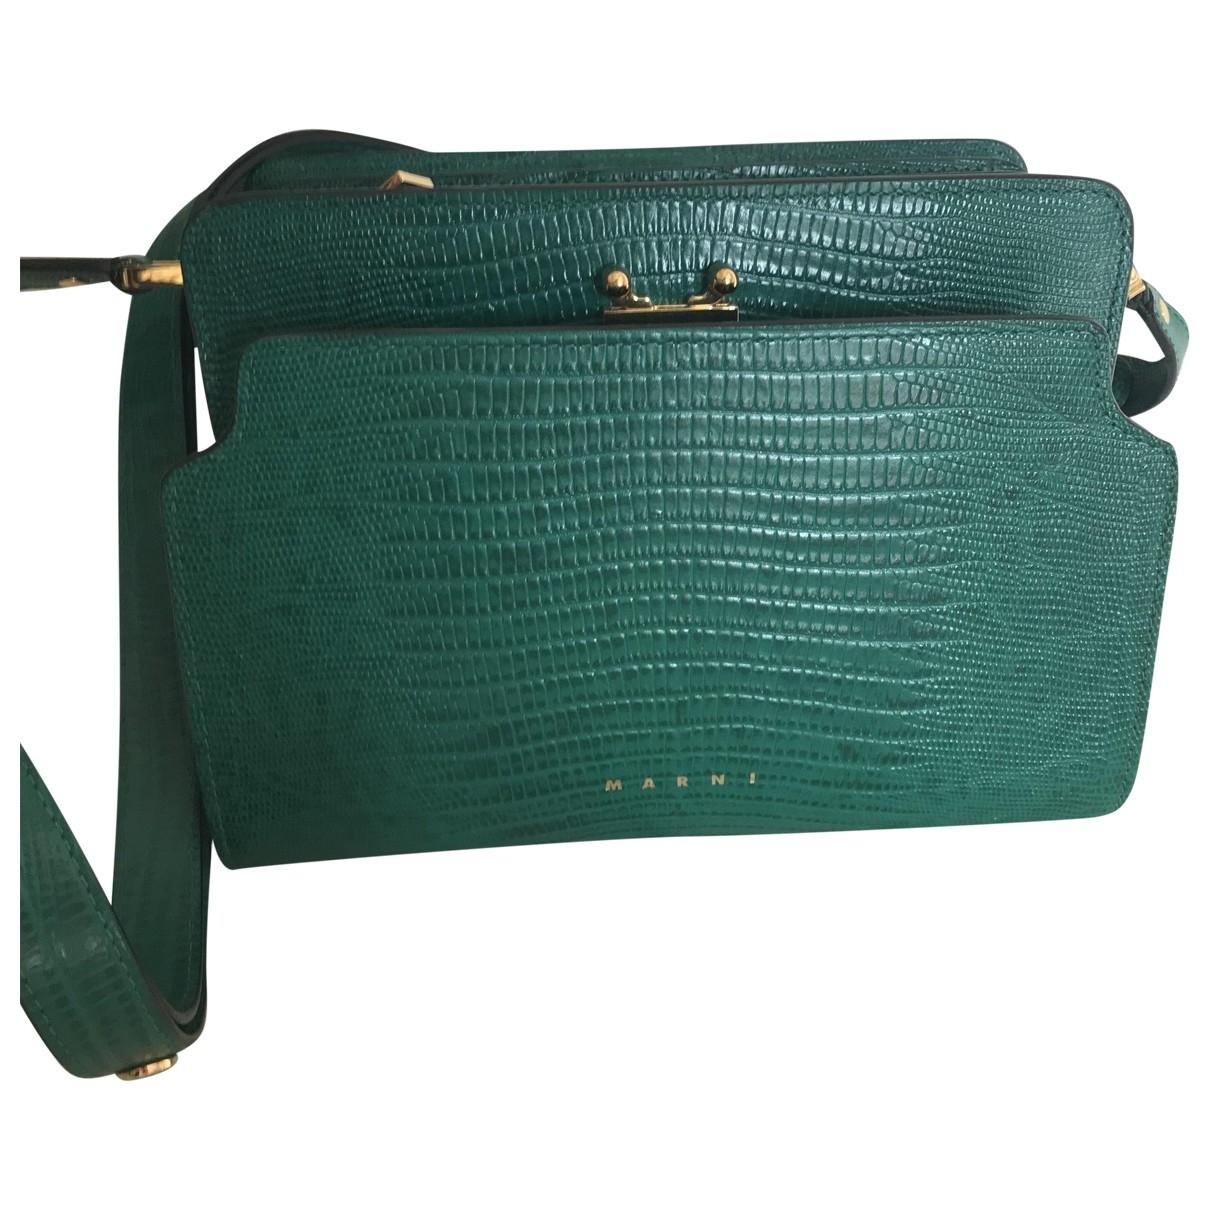 Marni Trunk Handtasche in  Gruen Leder